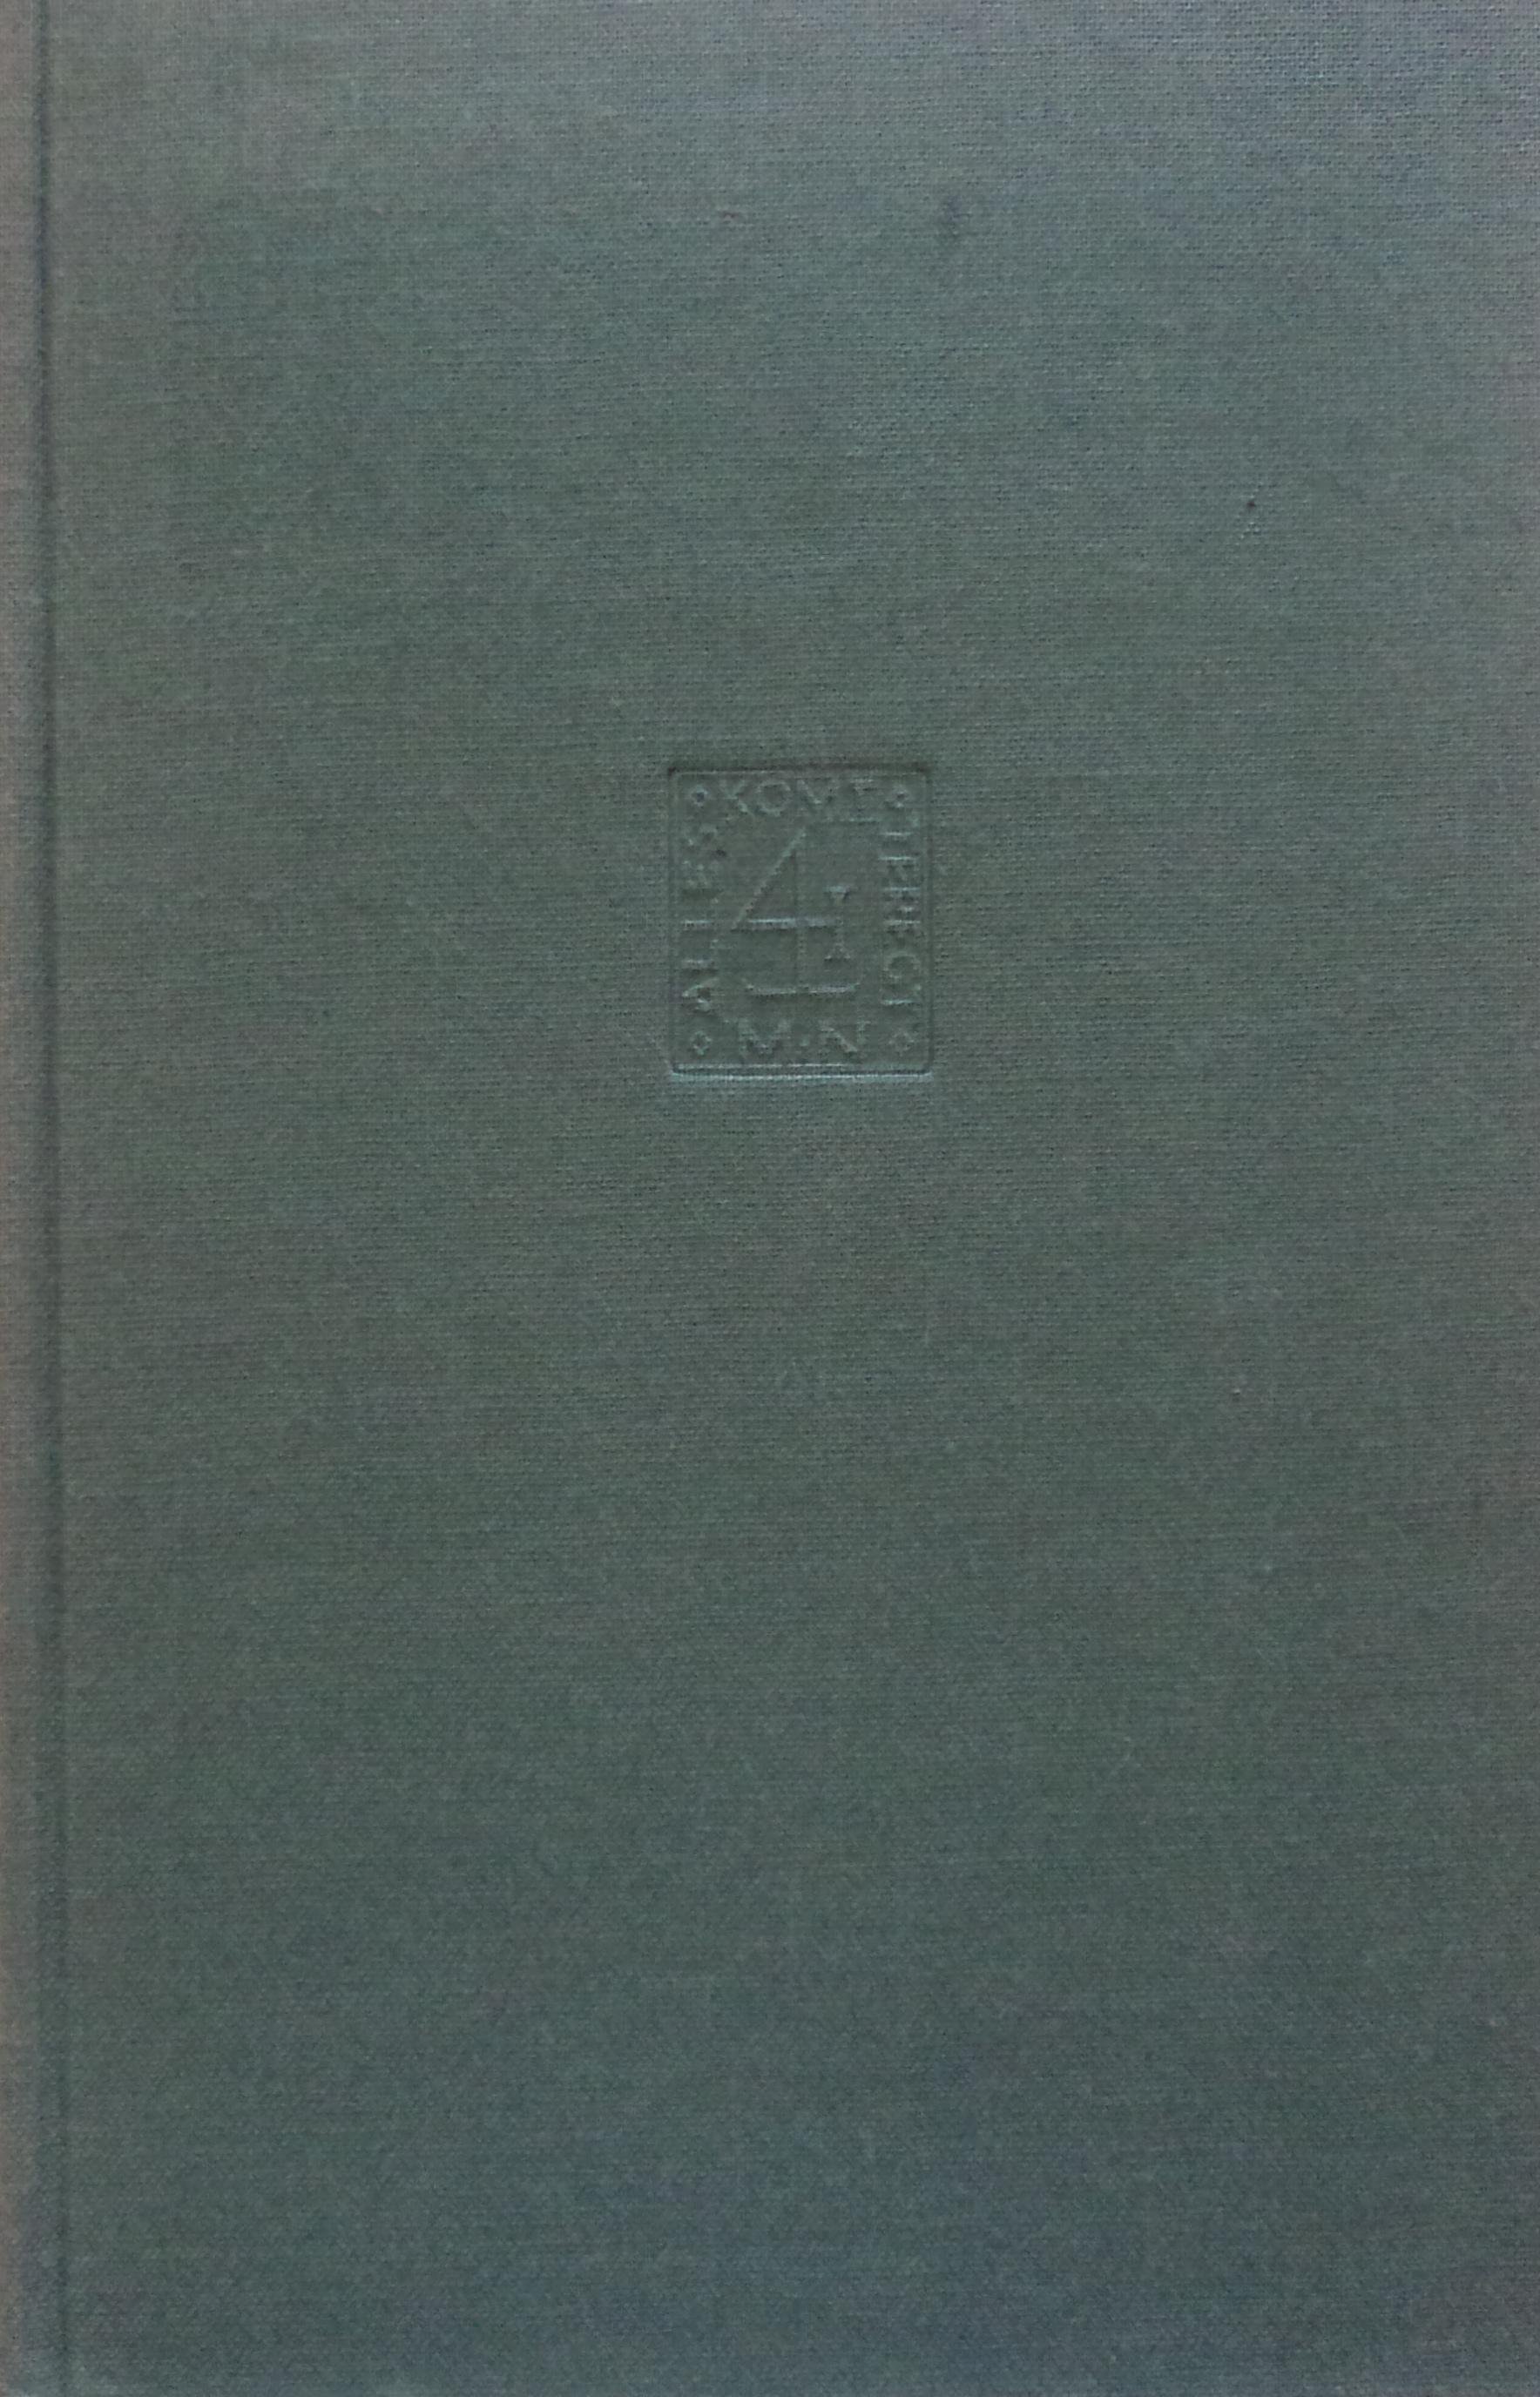 Inventaire de la Correspondance de Johannes Fredericus Gronovius (1631-1671) (International Archives of the History of Ideas Archives internationales d'histoire des idées) (French Edition) - Dibon, Paul (Editor), and Bots, J A (Editor), and Bots-Estourgie, E (Editor)